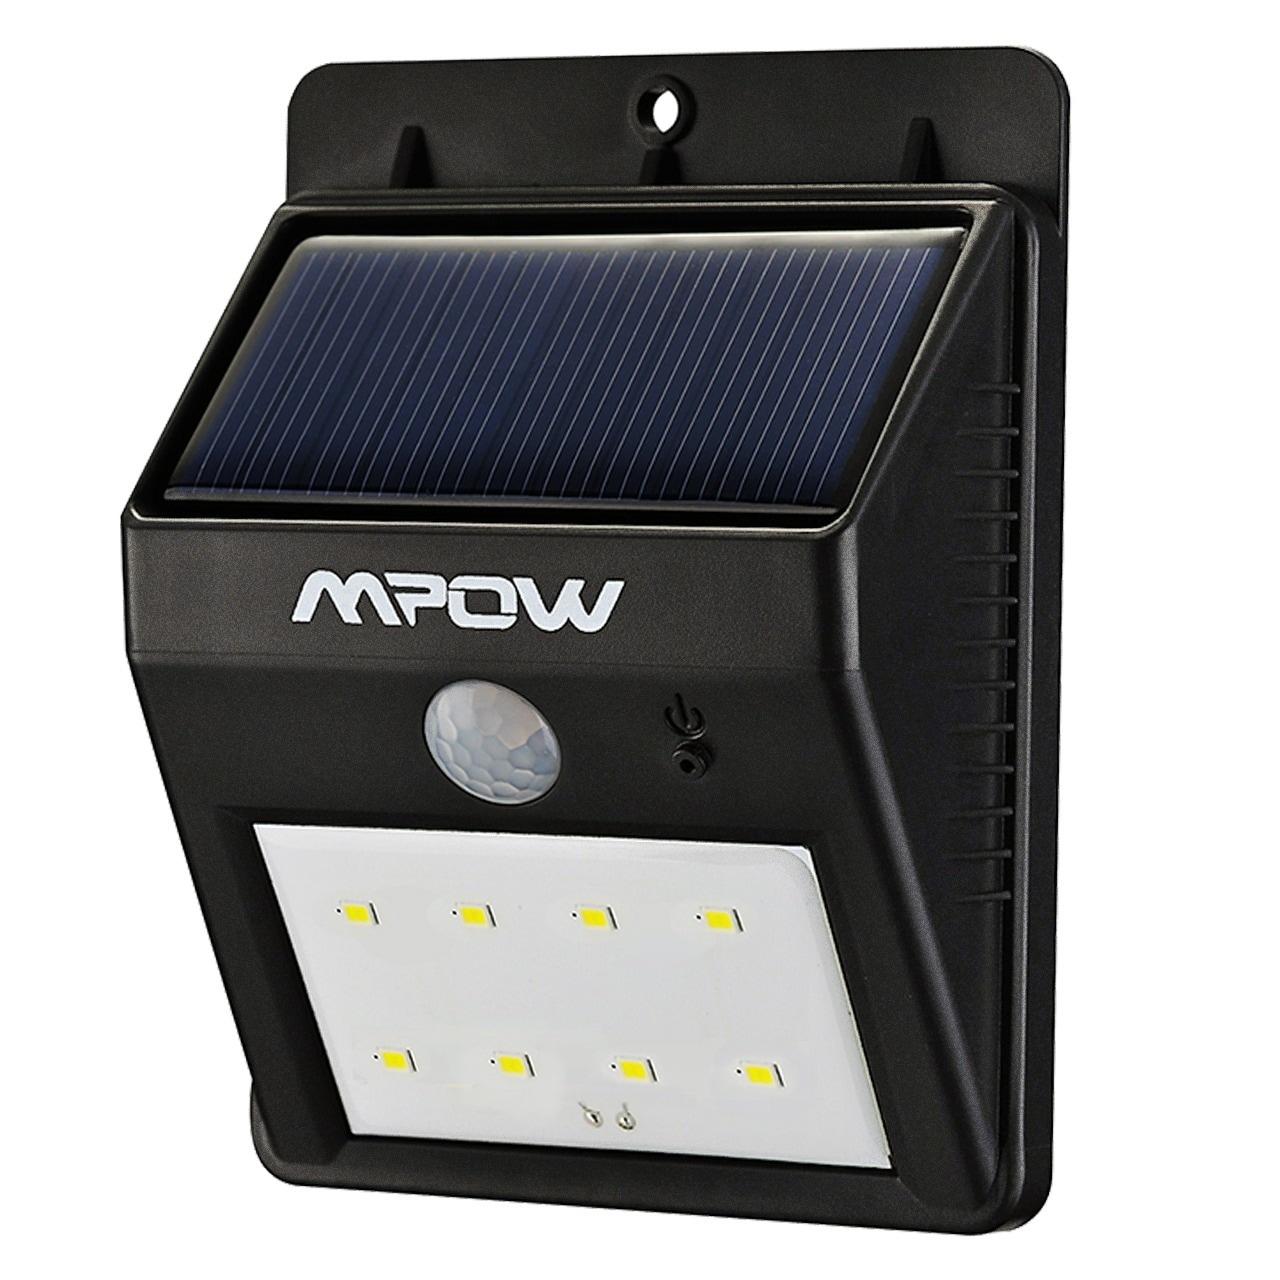 Mpow Solar Powerd Wireless LED Security Motion Sensor Lig...